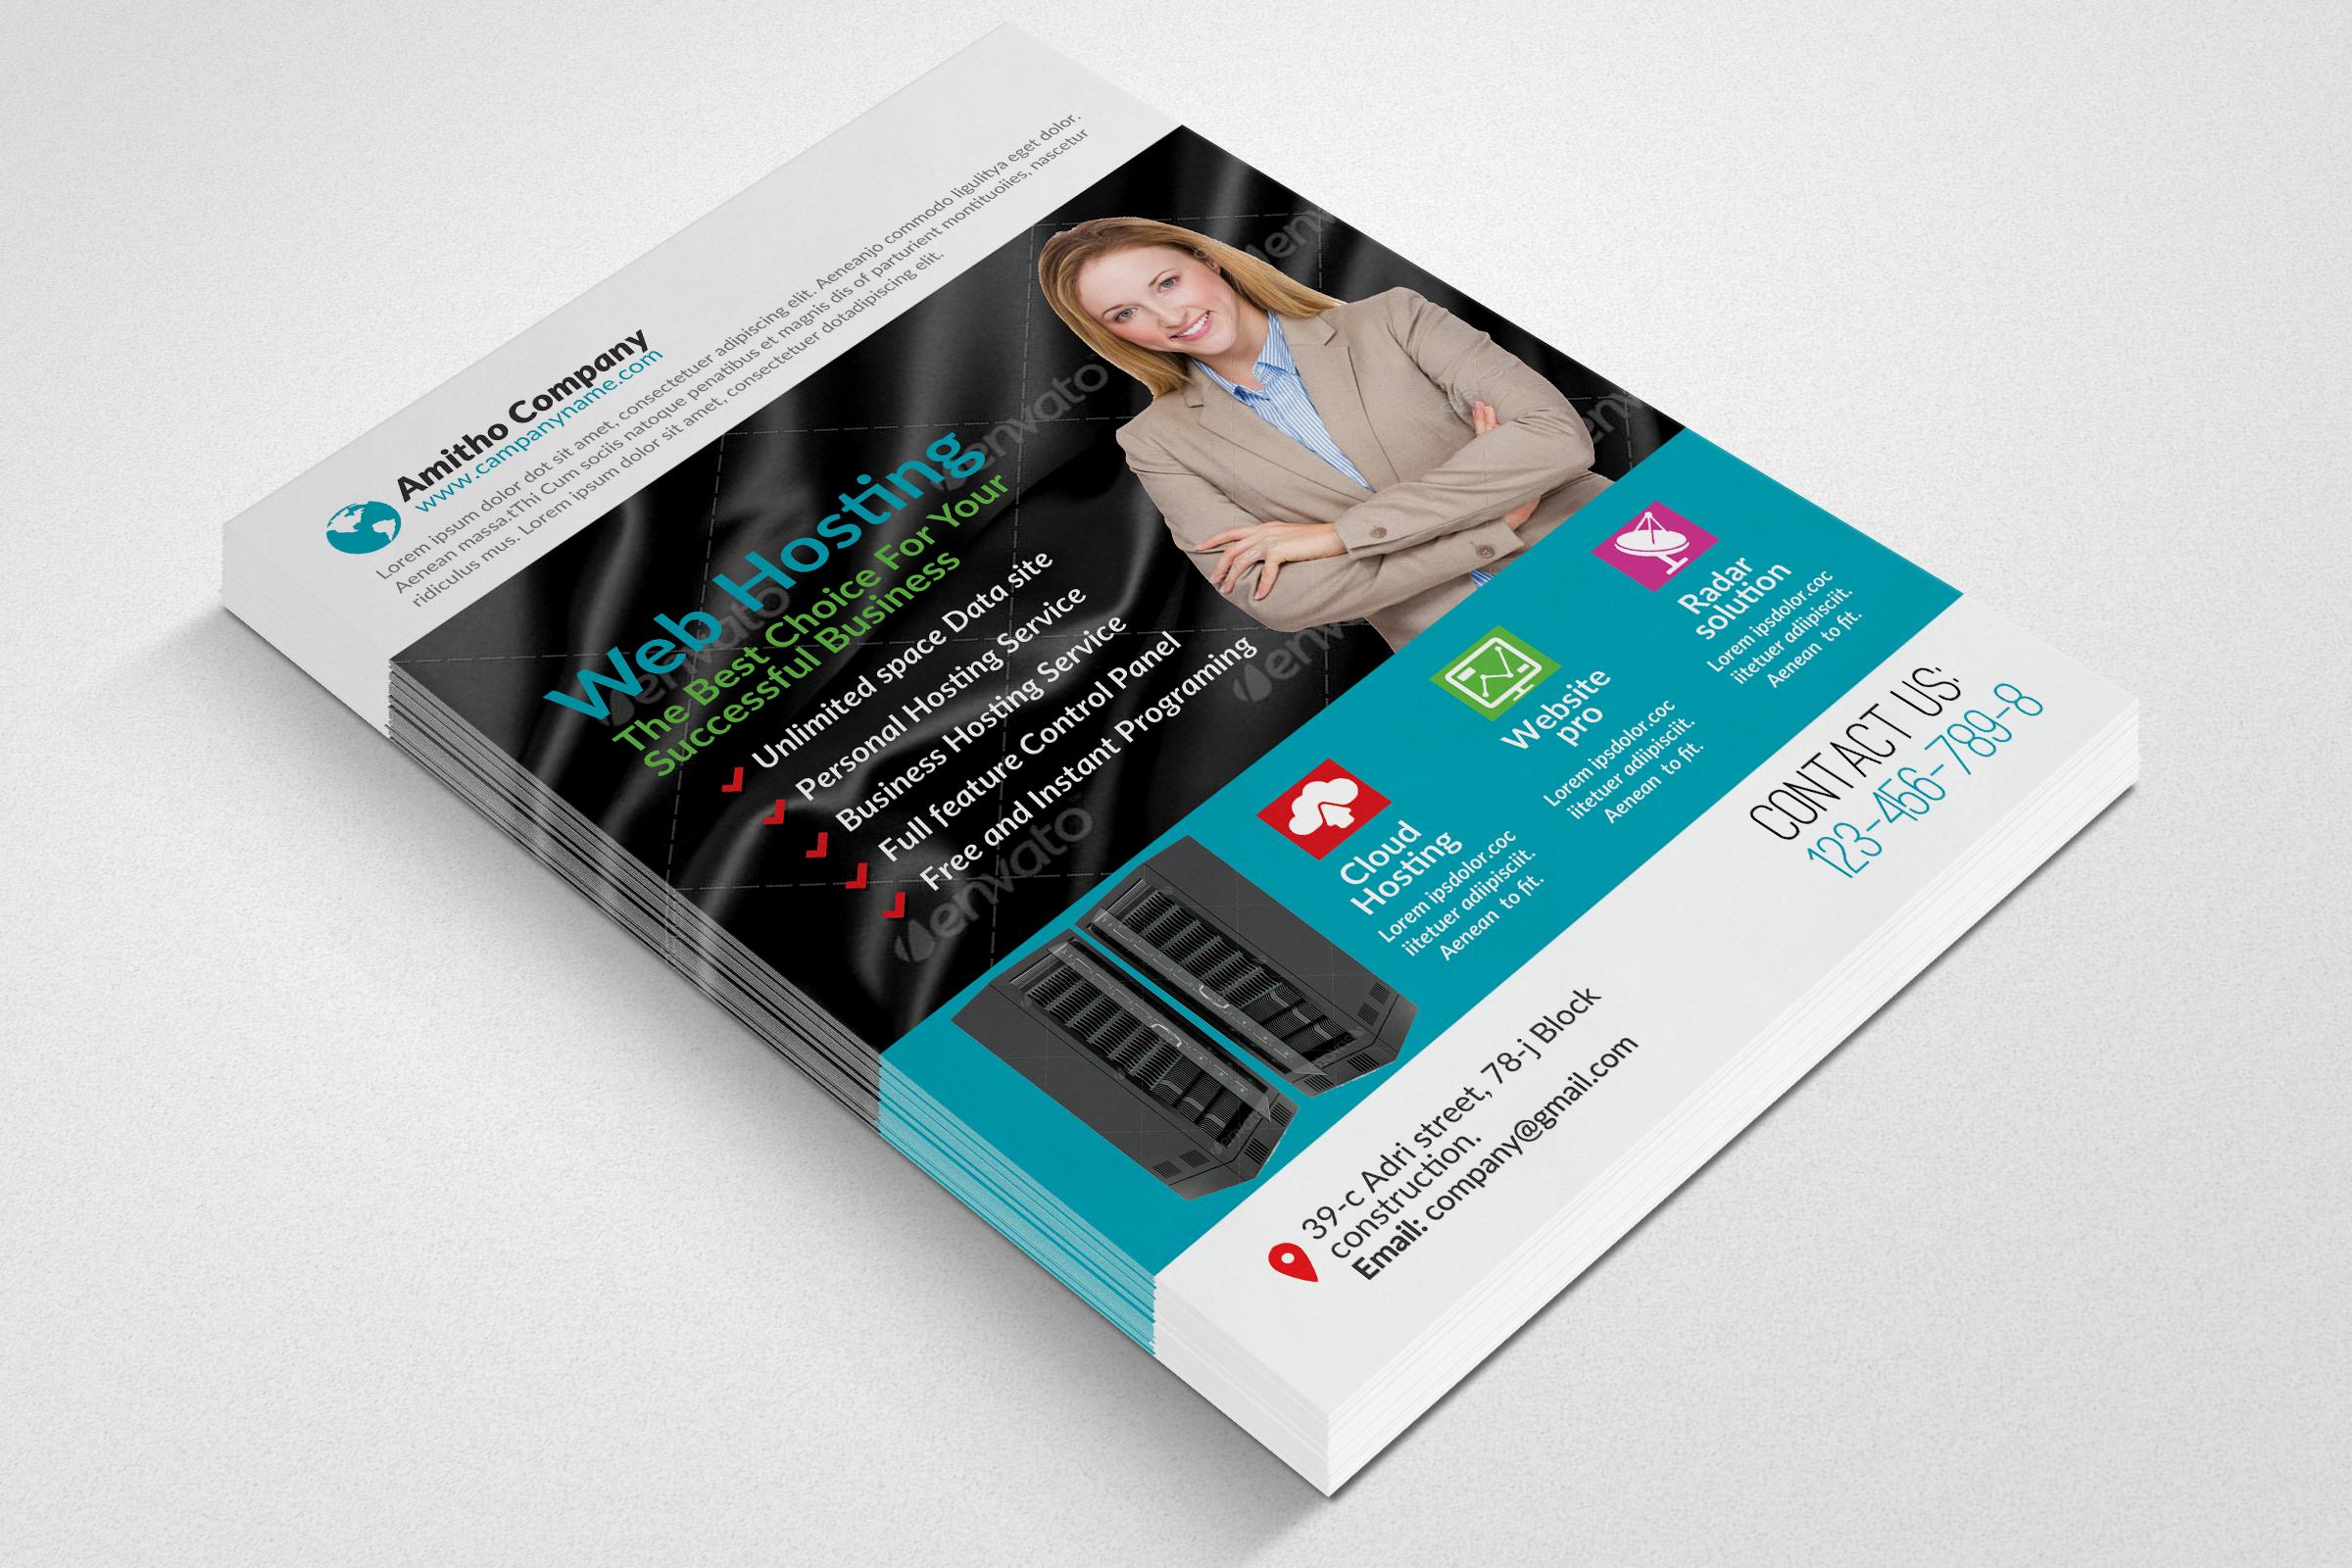 Web Hosting Flyer example image 2